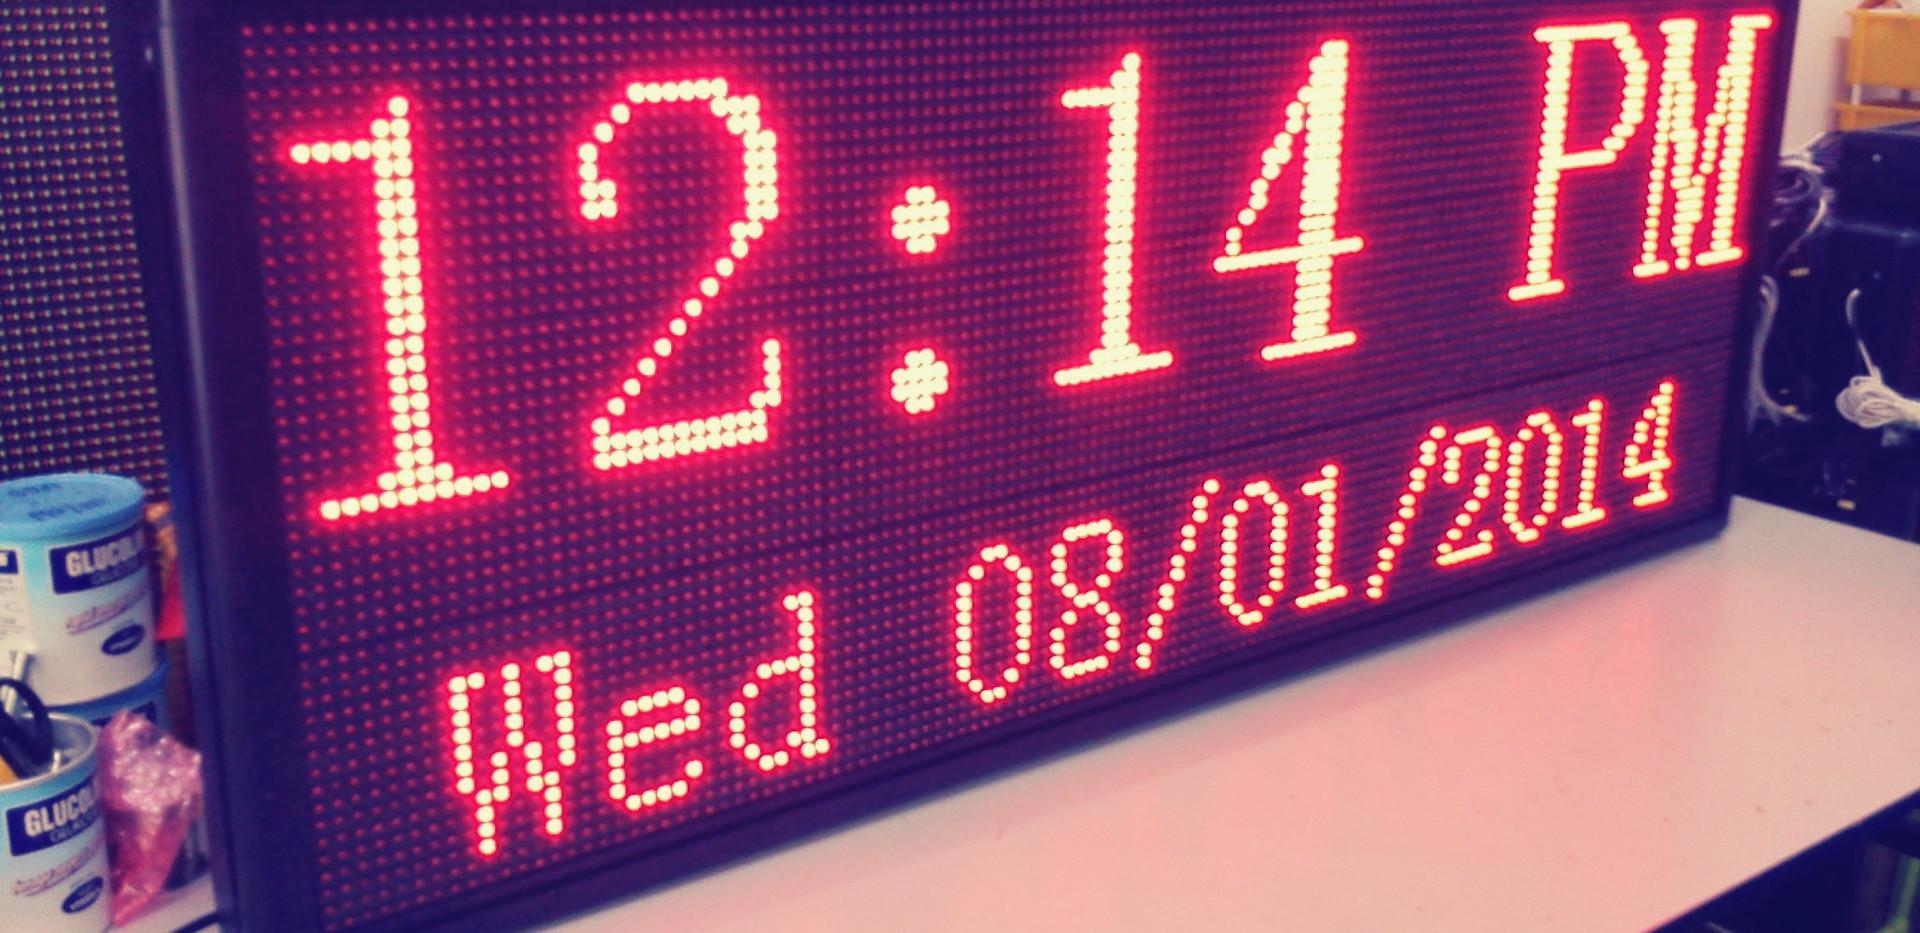 digital-clocks.jpg